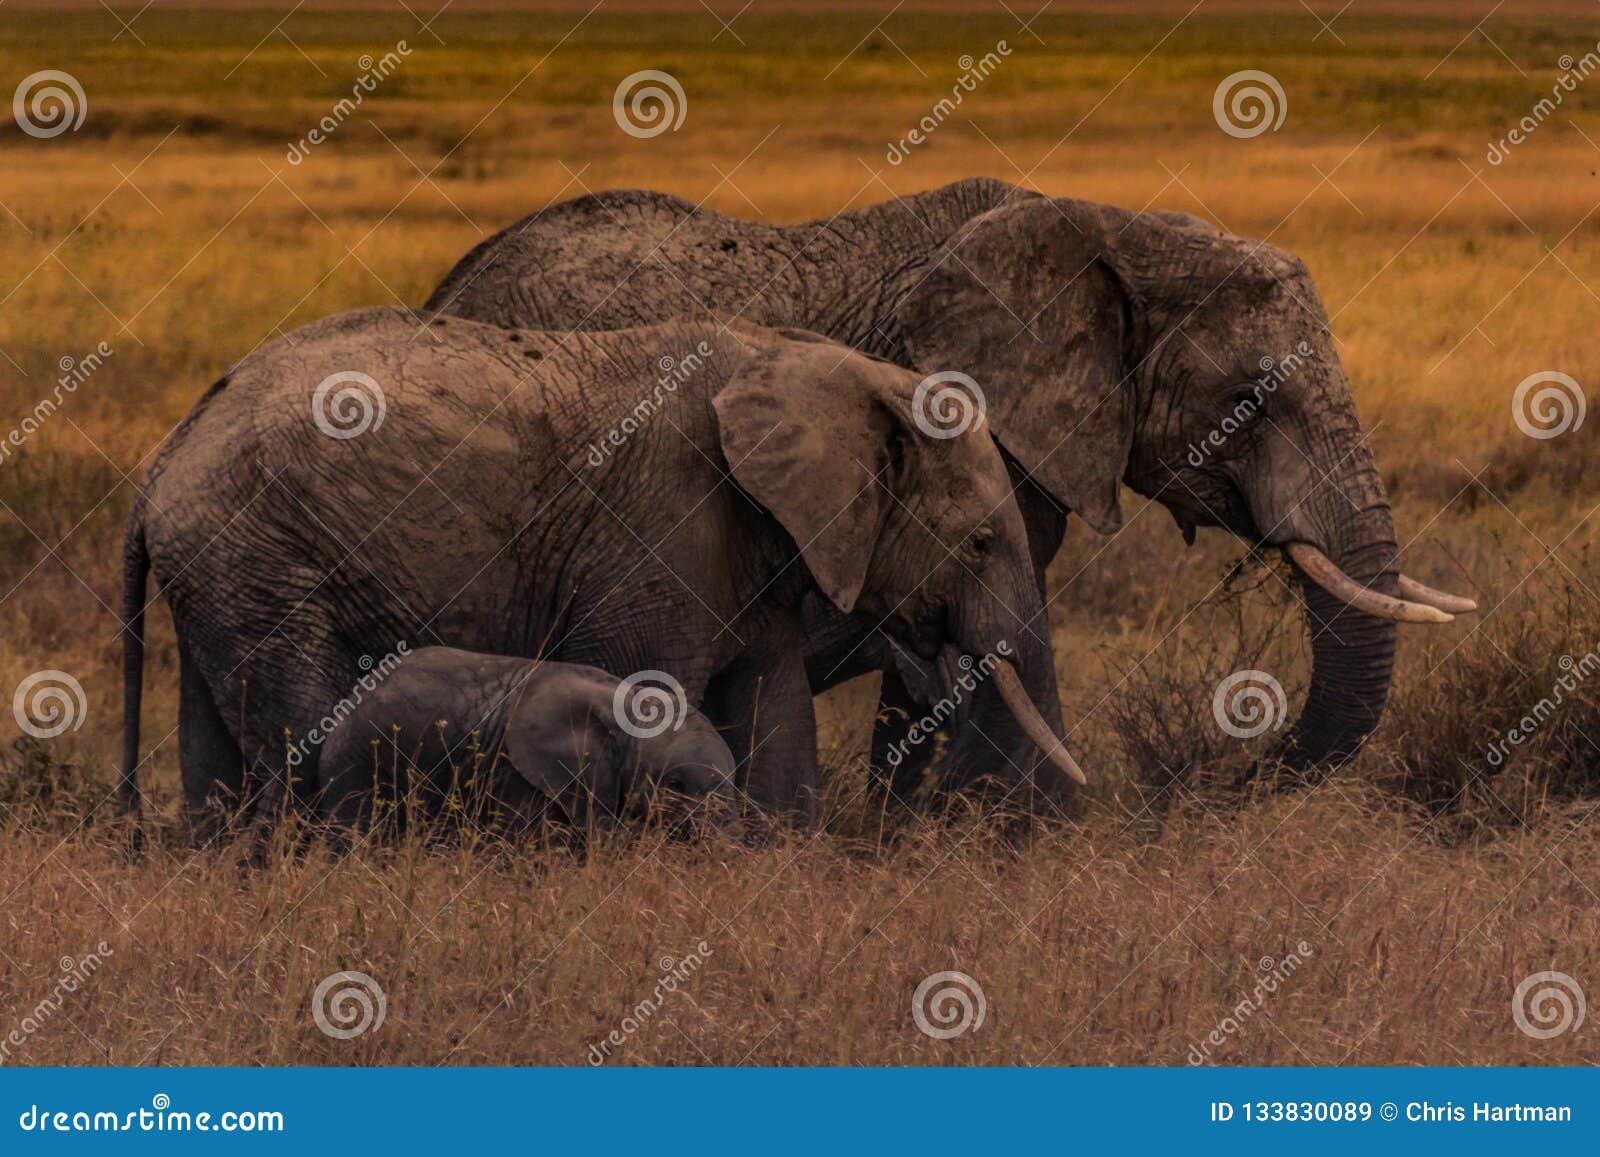 Elephant family of the Serengeti Plains